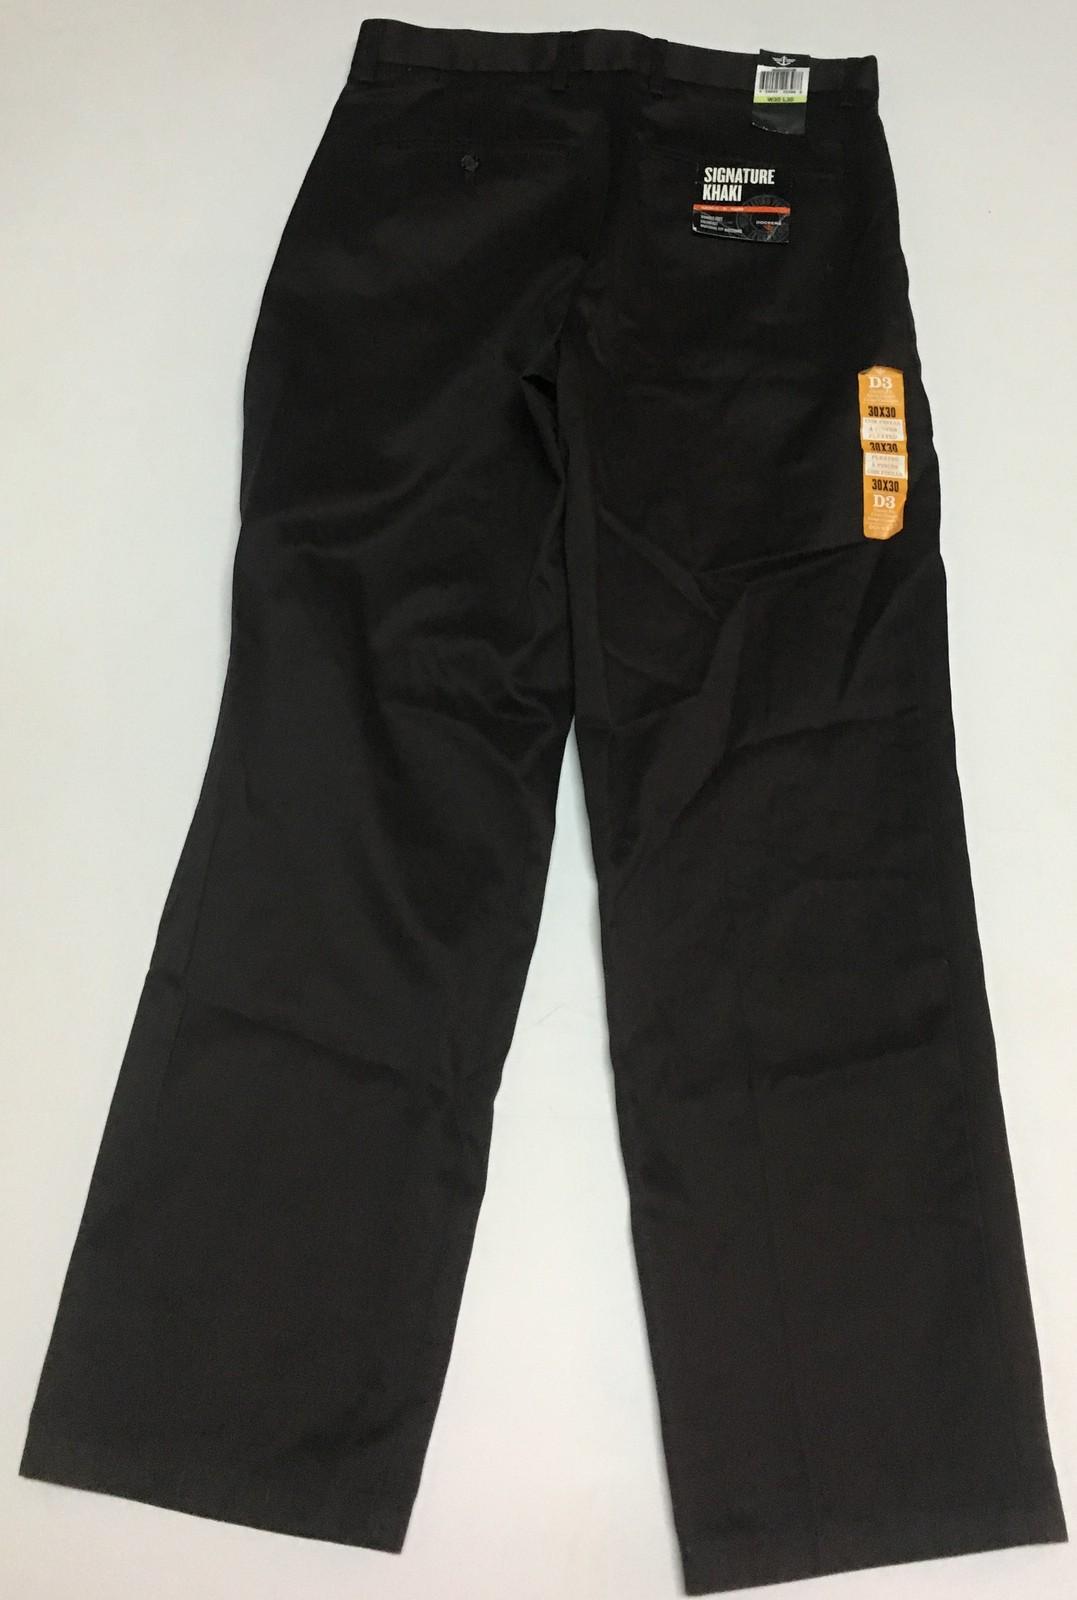 Dockers Signature Khaki Pants Men's 30 x 30 Dark Chocolate NWT Wrinkle Free